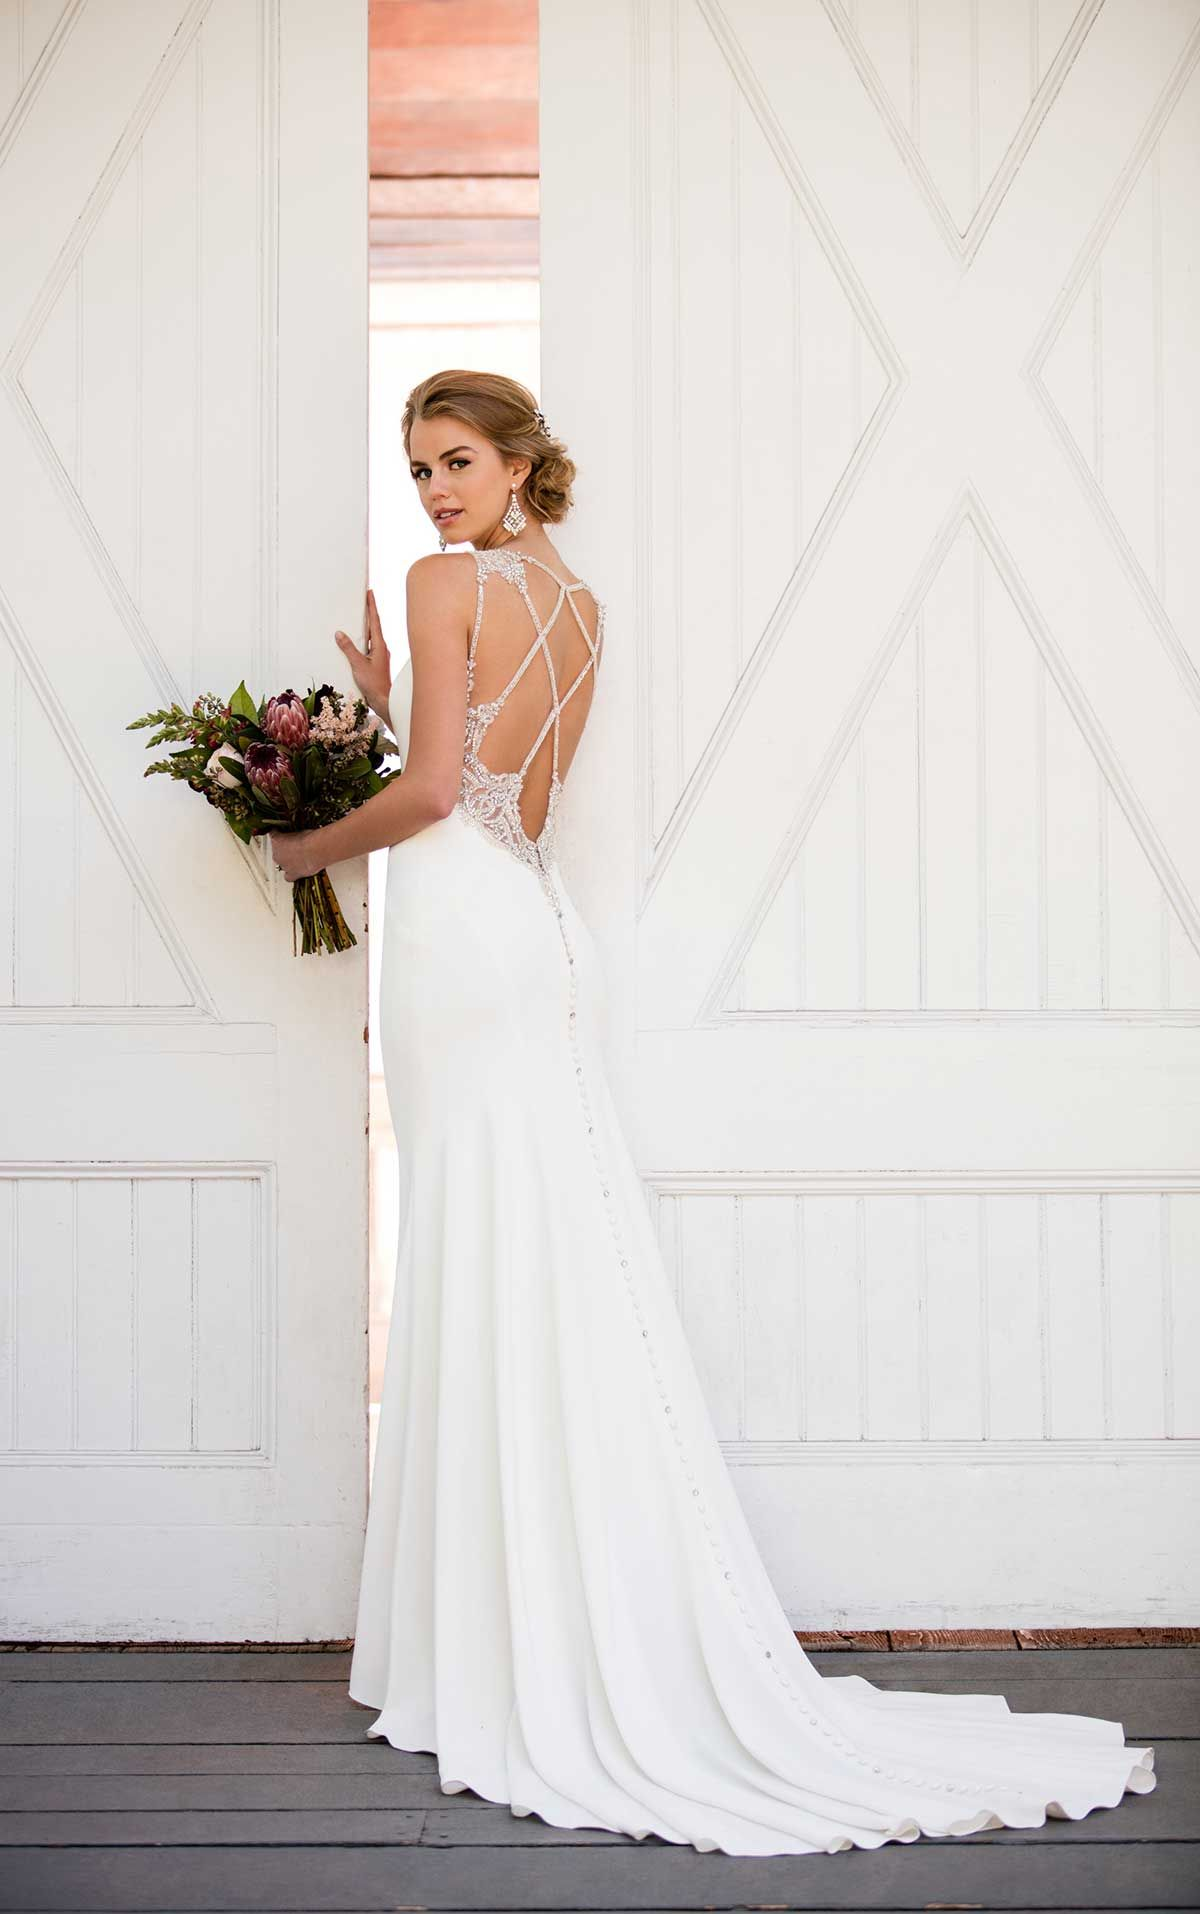 Simple Beaded Wedding Gown | Essense of Australia | Pinterest ...